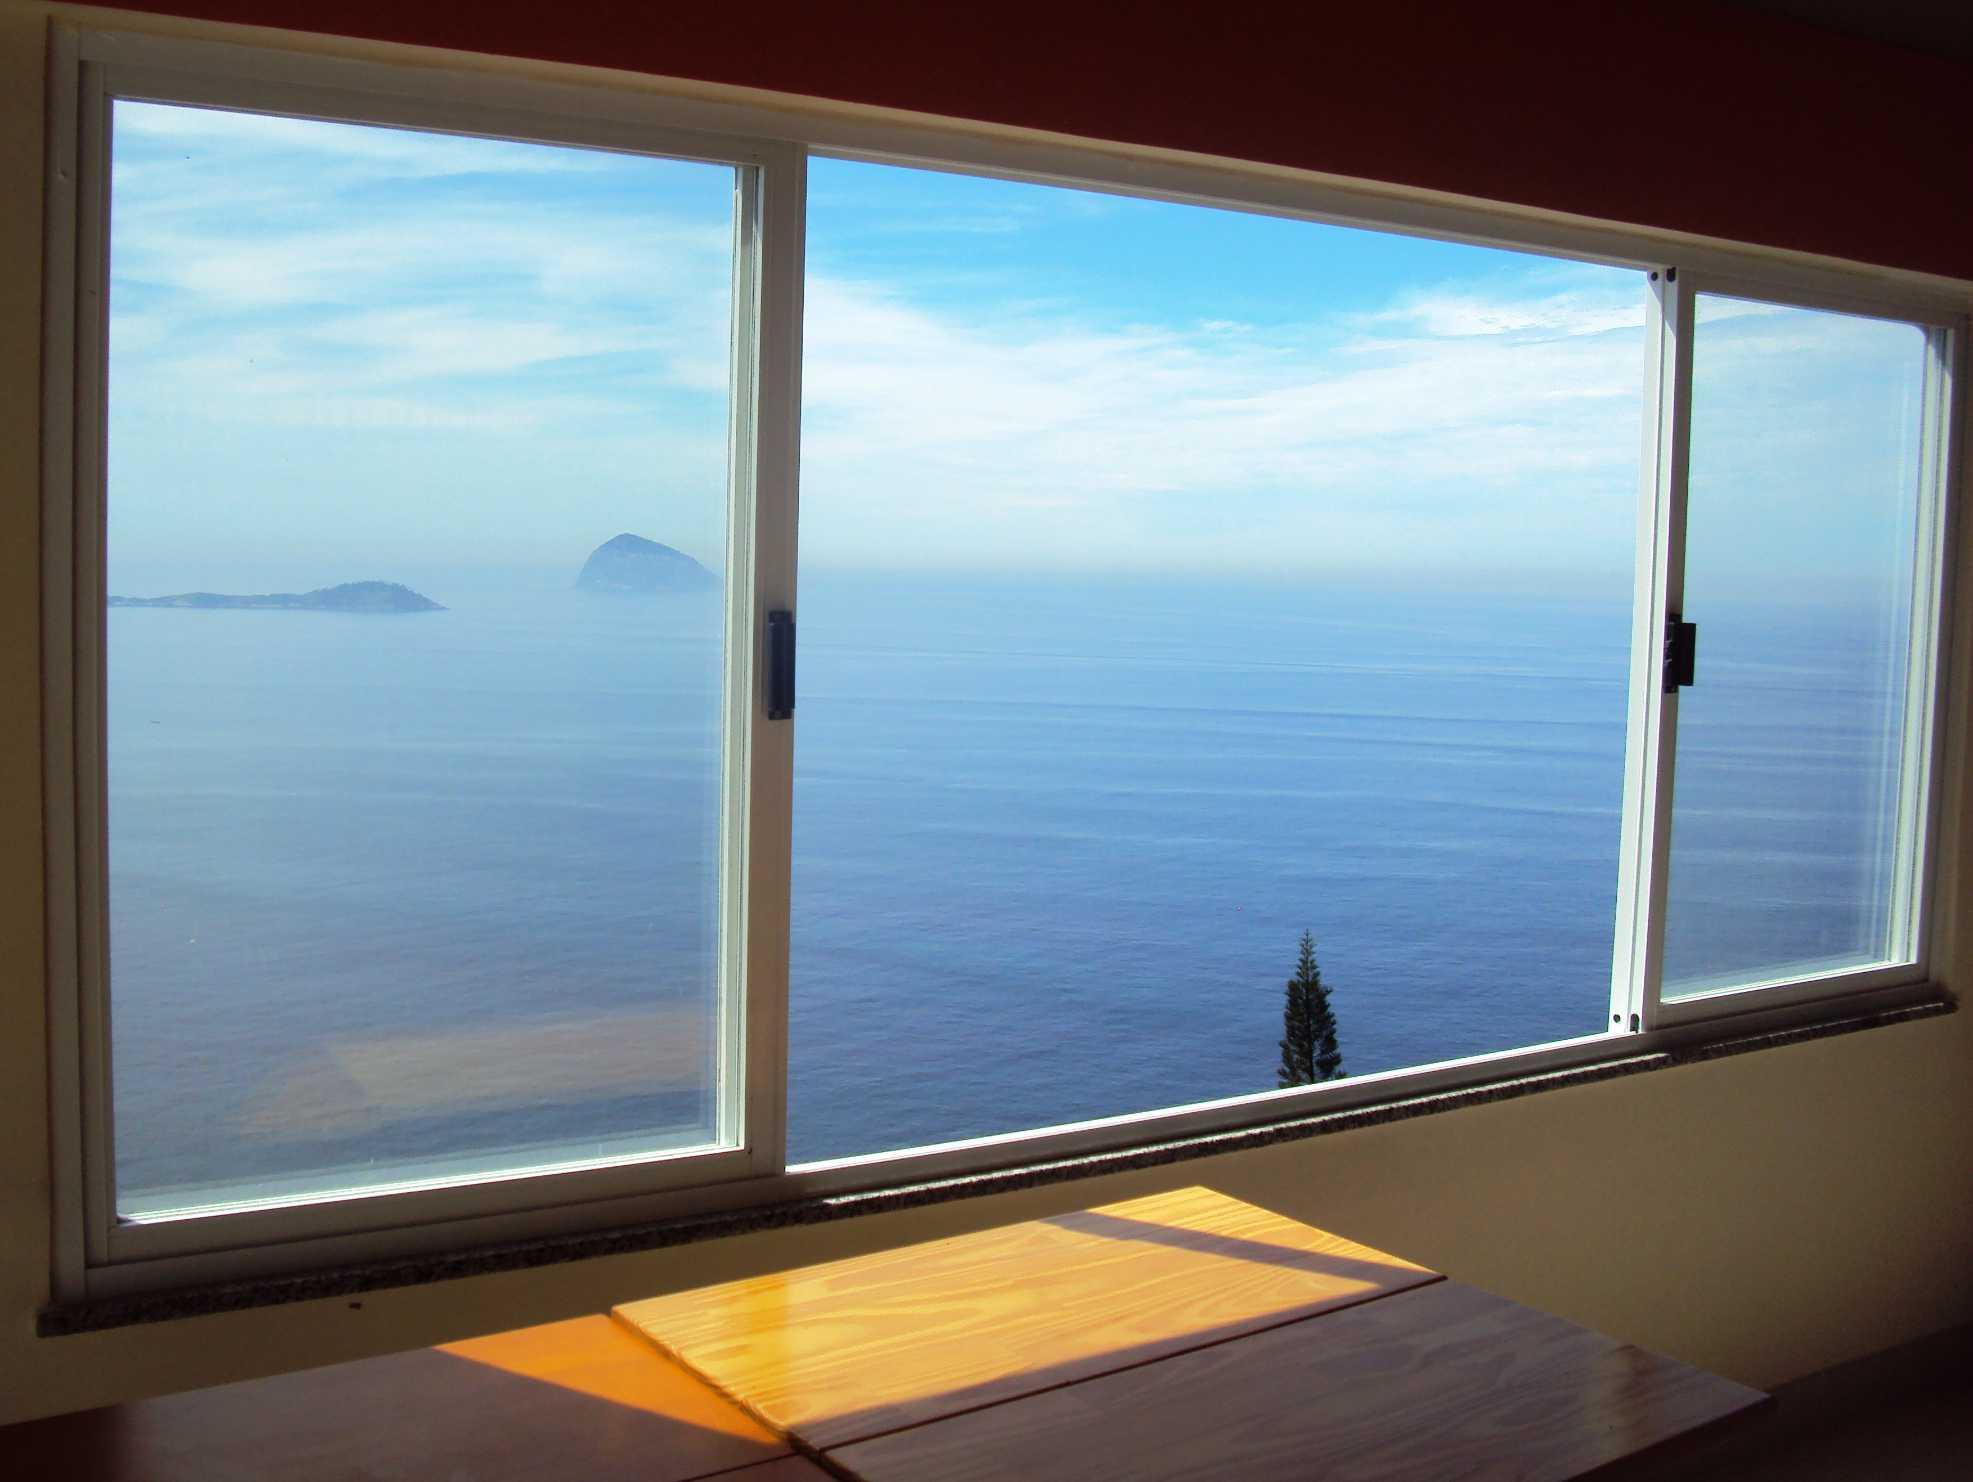 vista da janela da nossa varanda